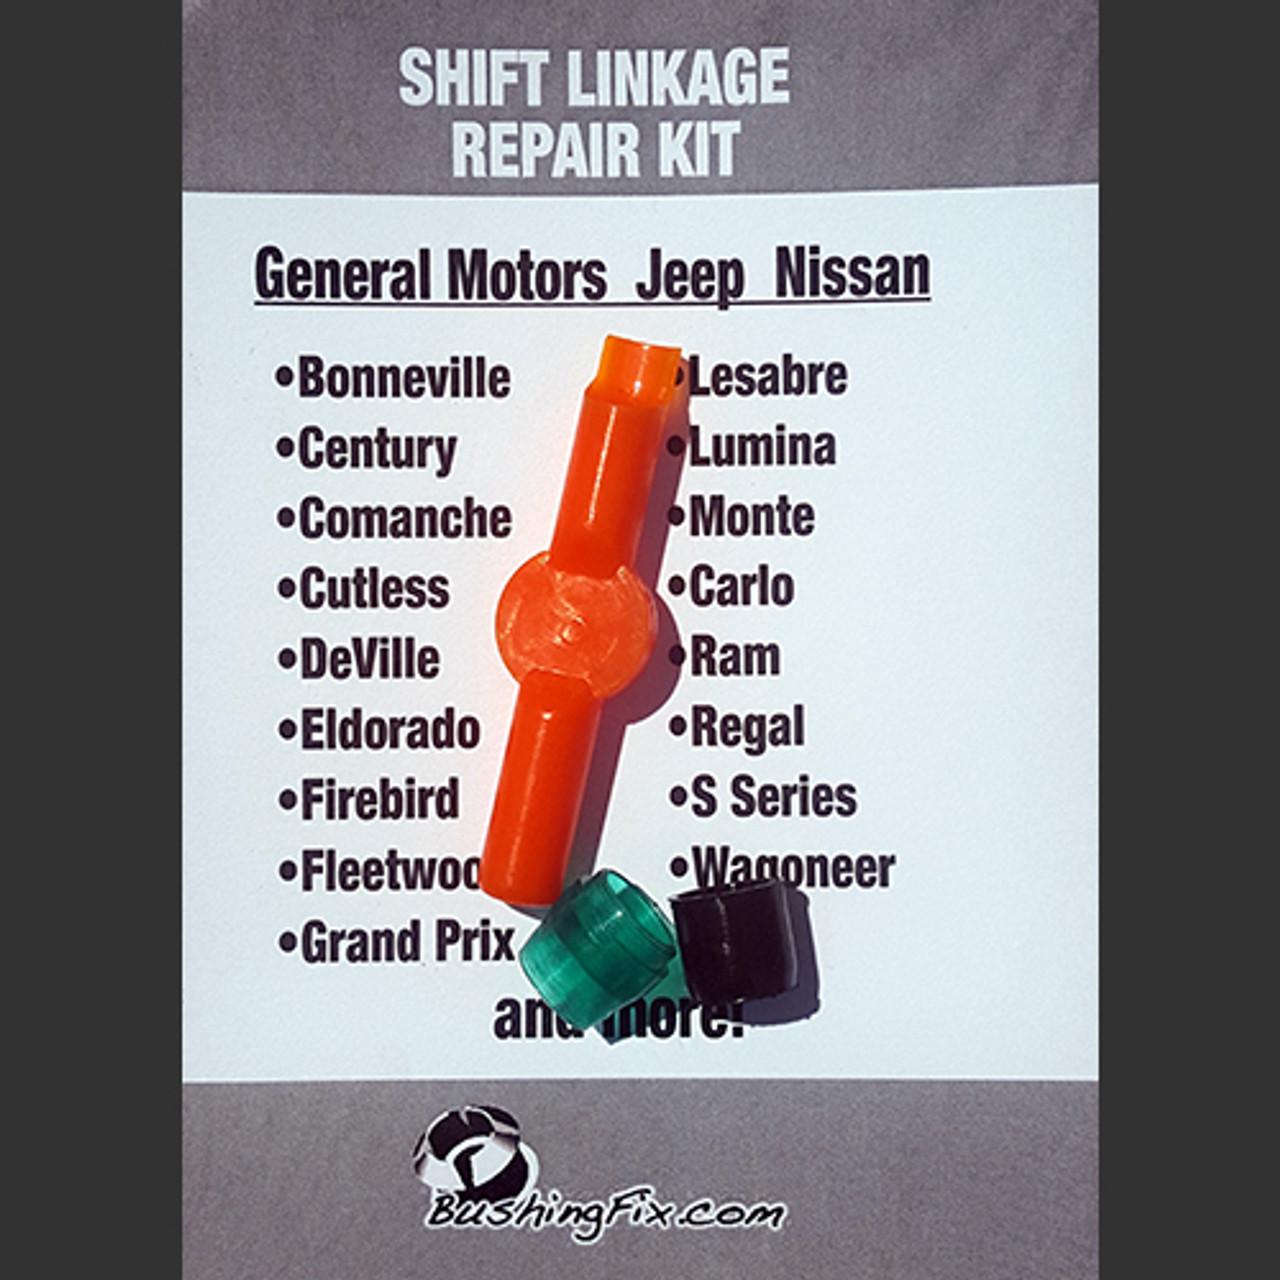 Chevrolet Lumina bushing repair kit